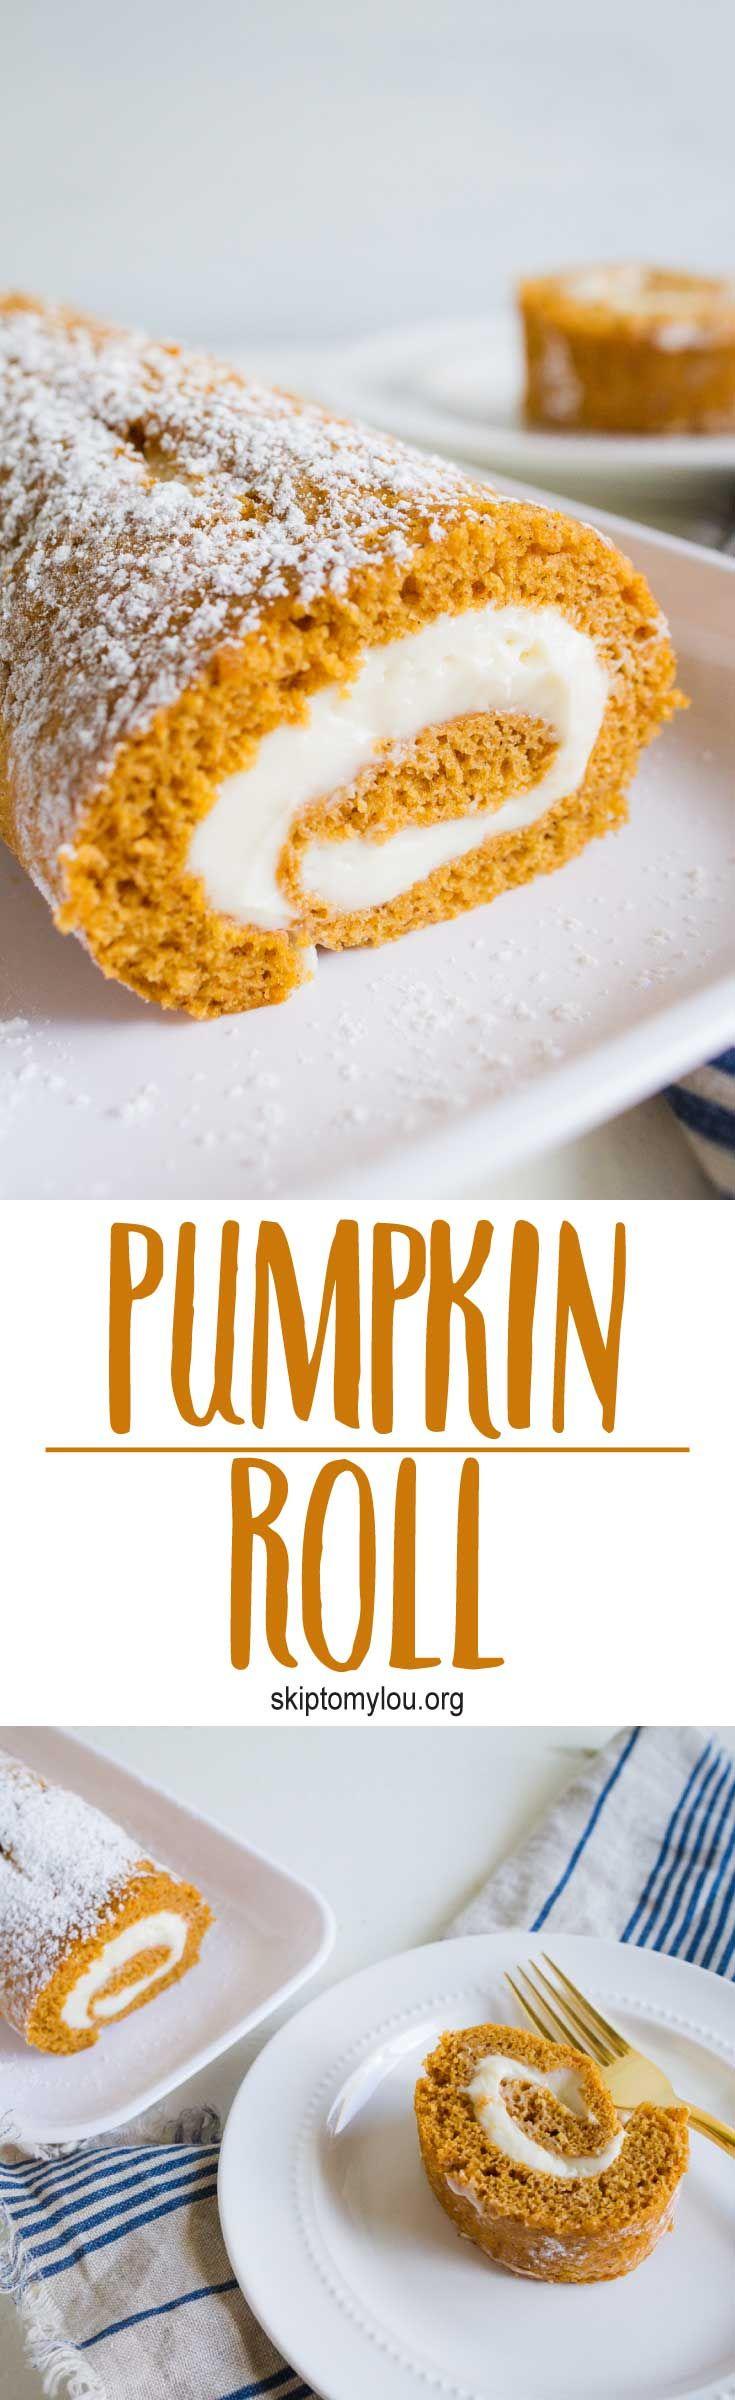 Easy pumpkin roll recipe!